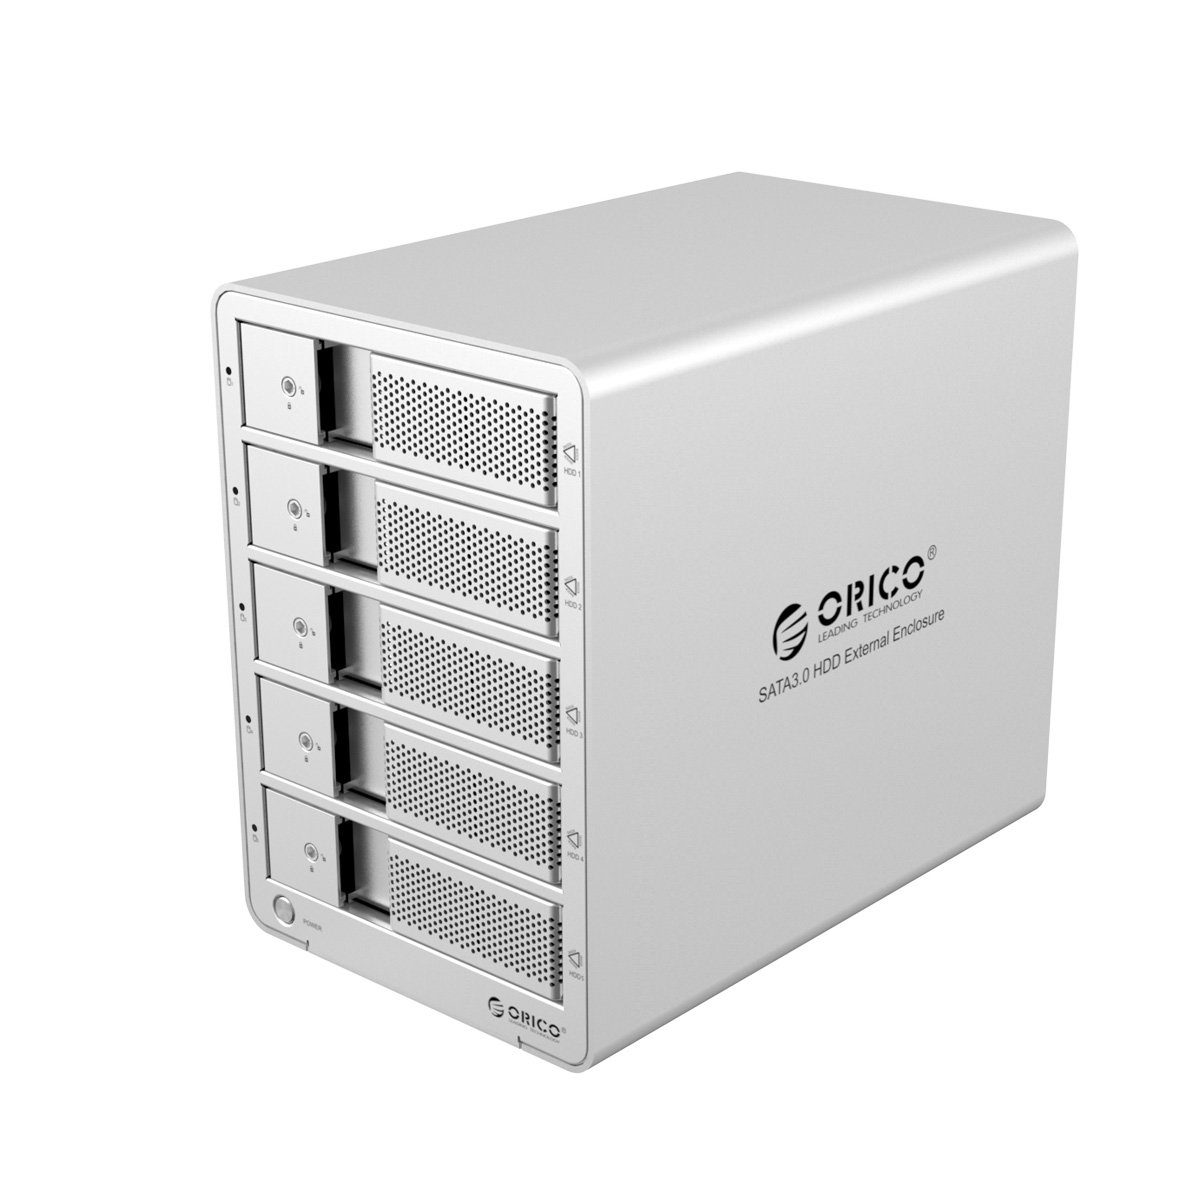 ORICO Tool Free Aluminum USB 3.0 5 bay 3.5-inch SATA Hard Drive Enclosure Support 5x 6TB Drive-Sliver (9558U3)